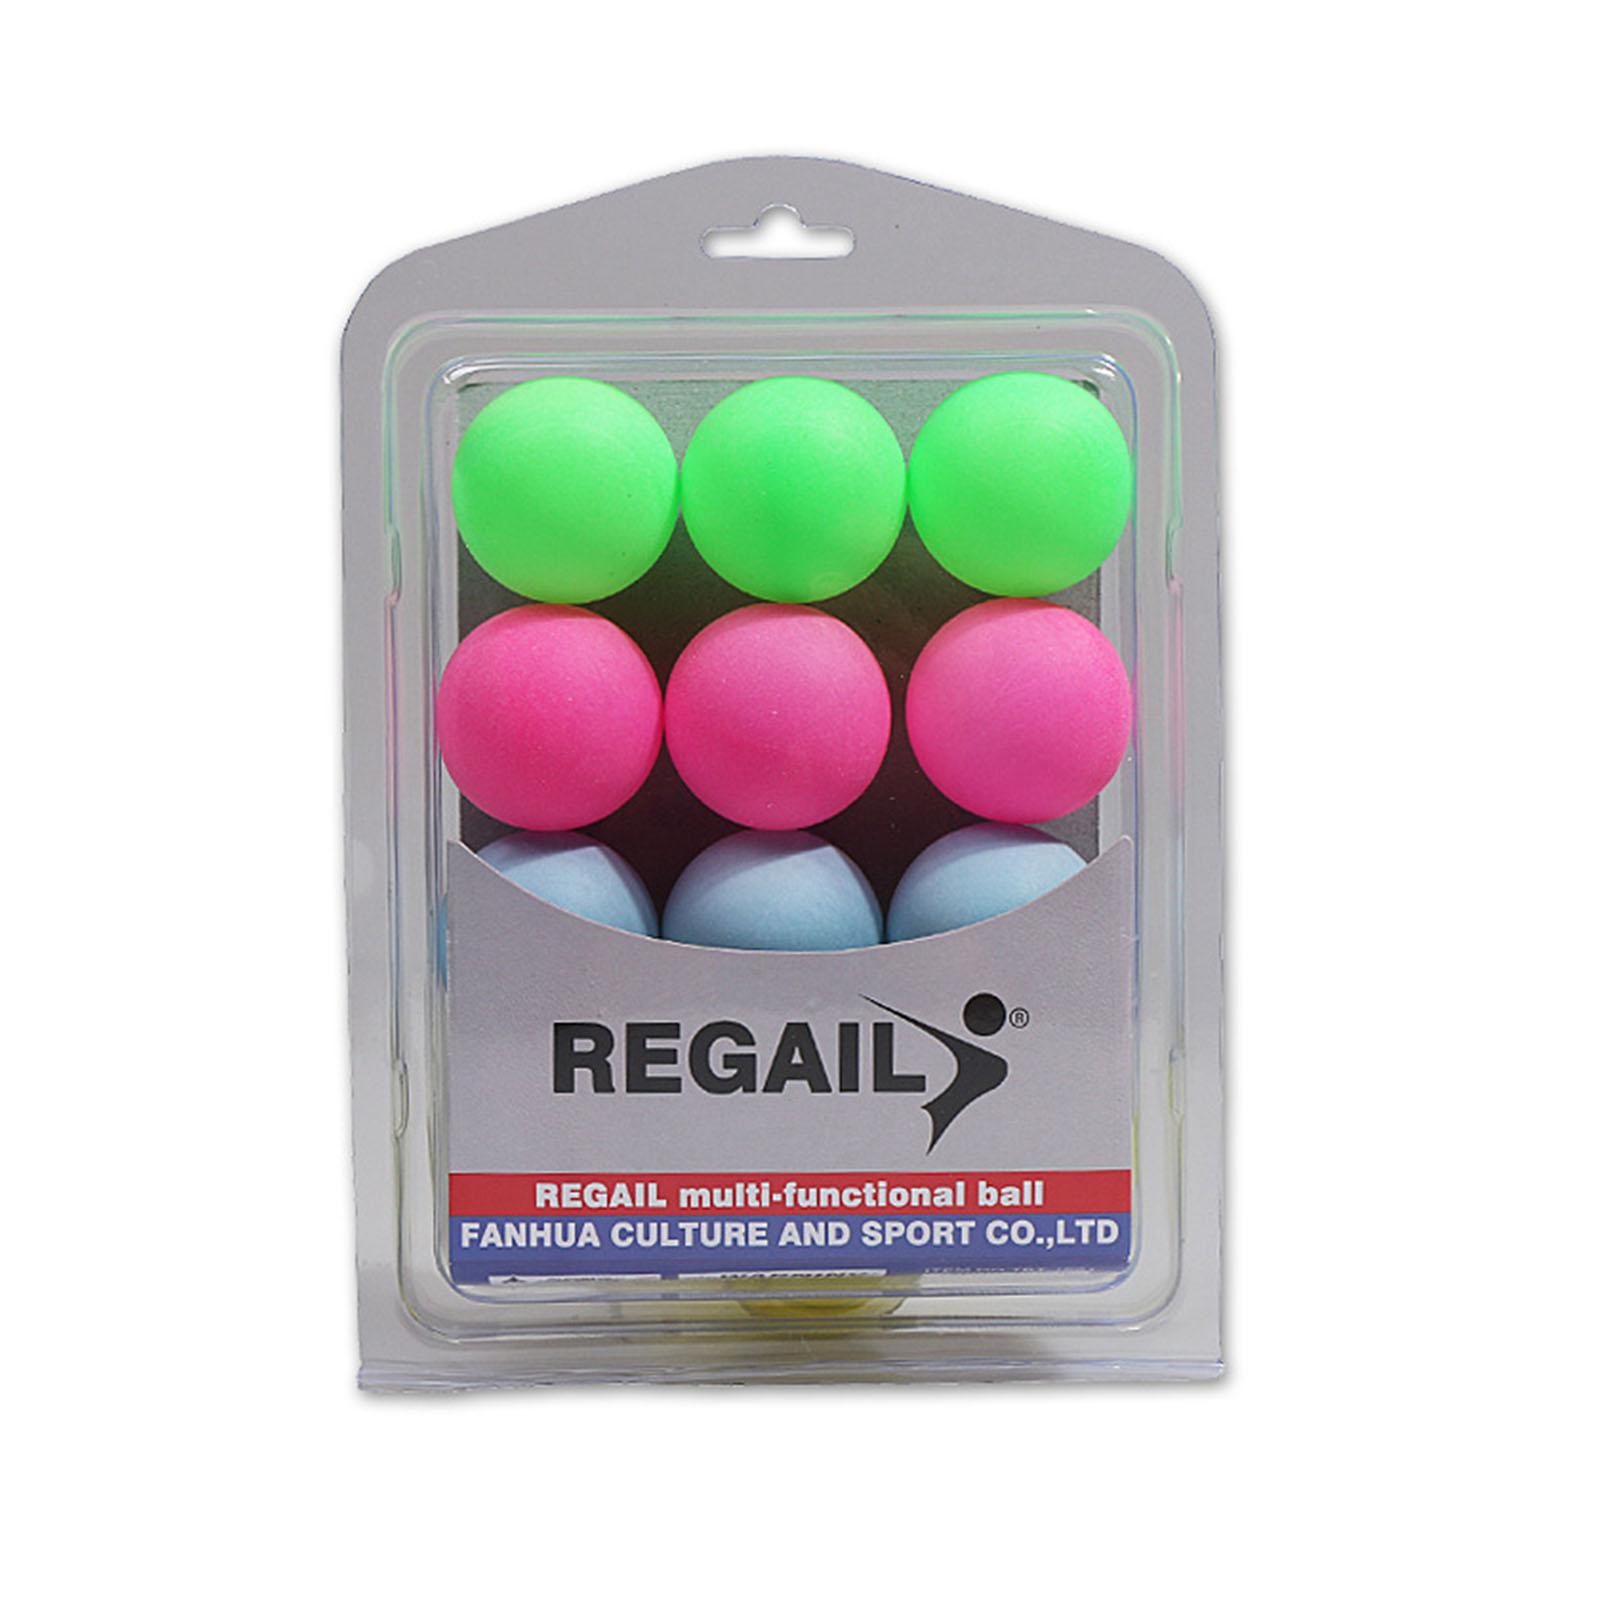 12PCS Boxed Table Tennis Colorful Plastic Entertain Ping Pong Balls Party Decoration Bounce Entertainment Balls